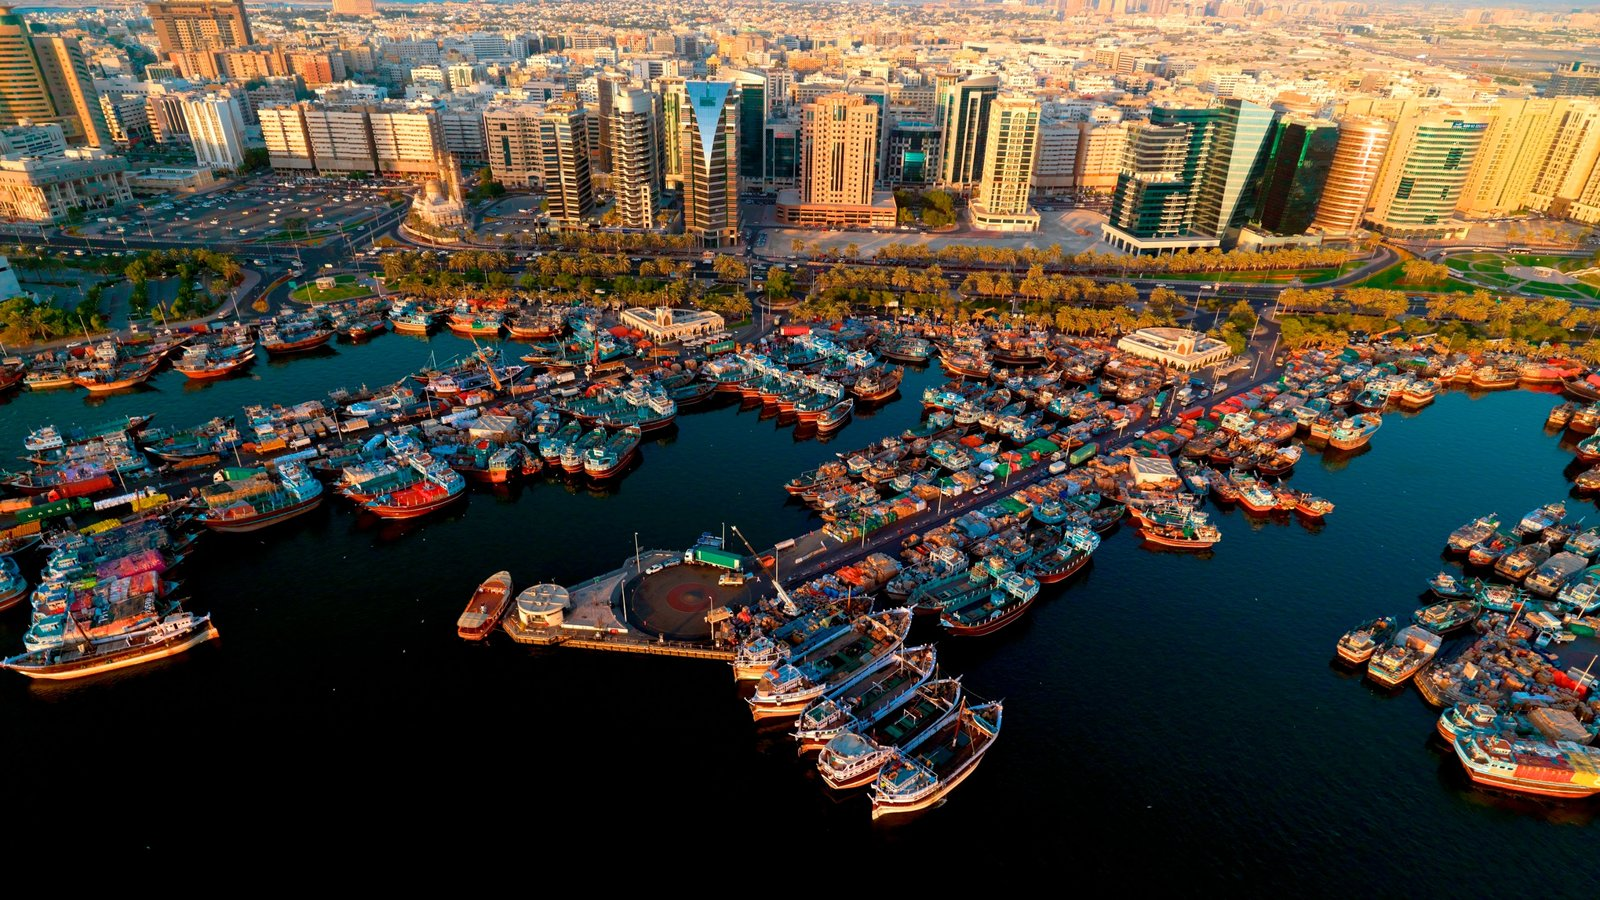 Dubai Creek showing boating, a marina and cbd